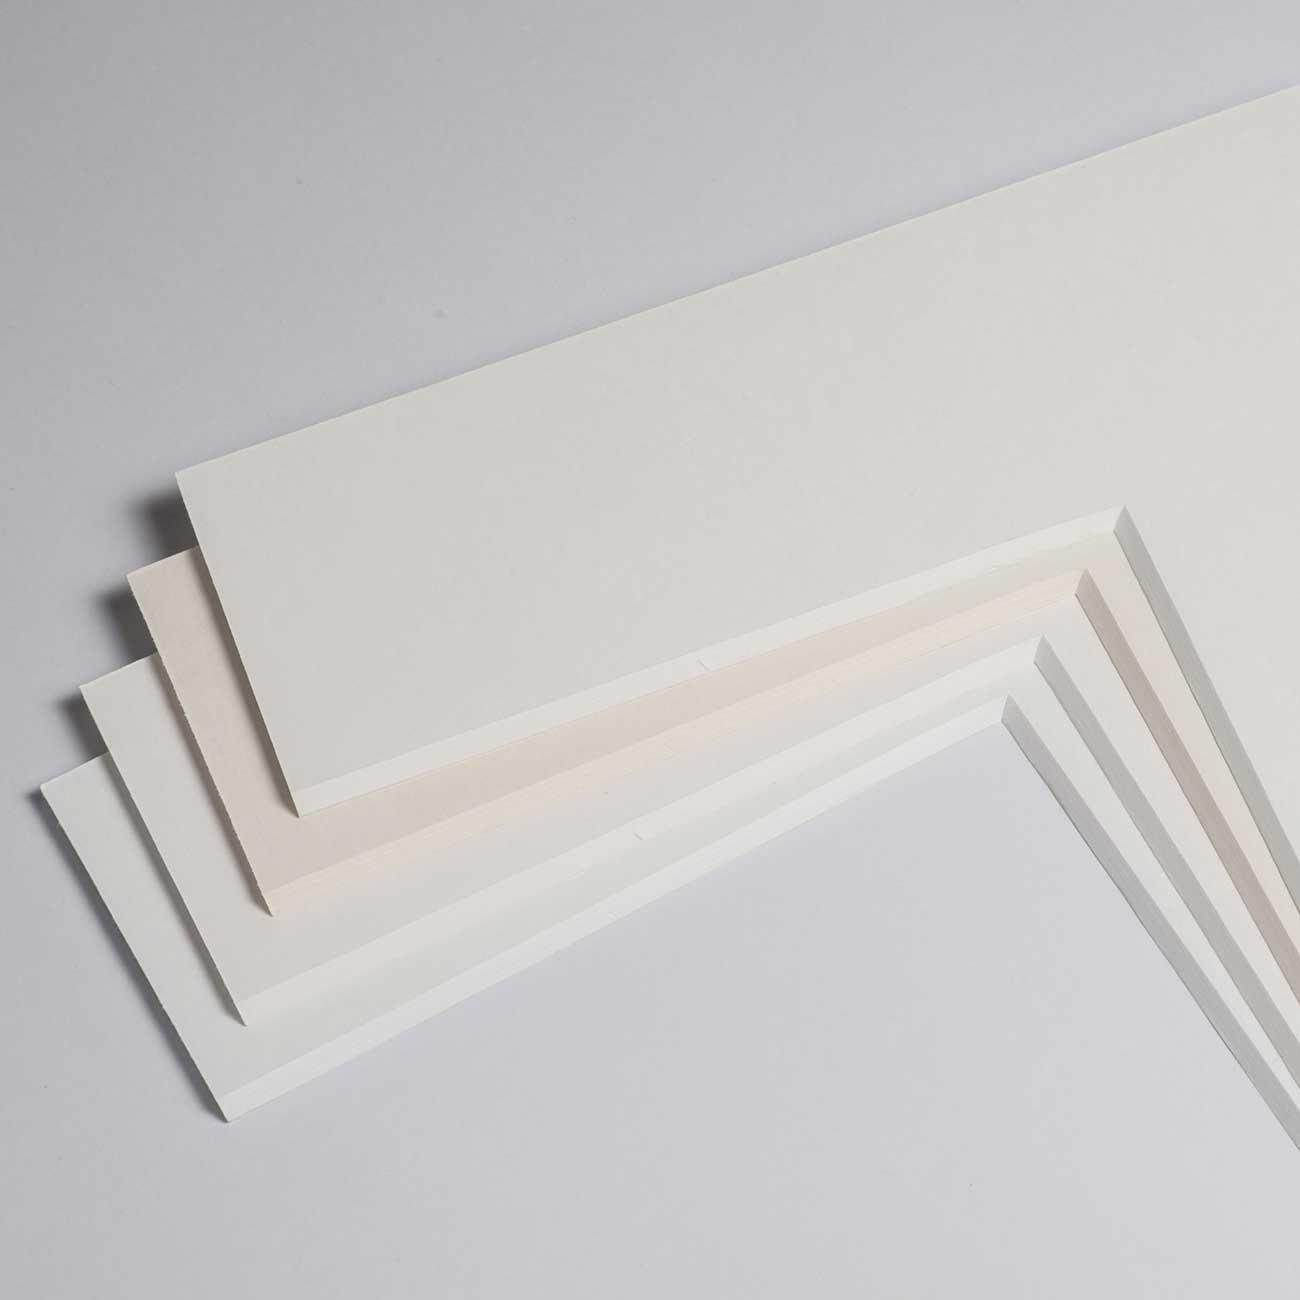 Standard-Passepartout -  Museumskarton 2,7 mm